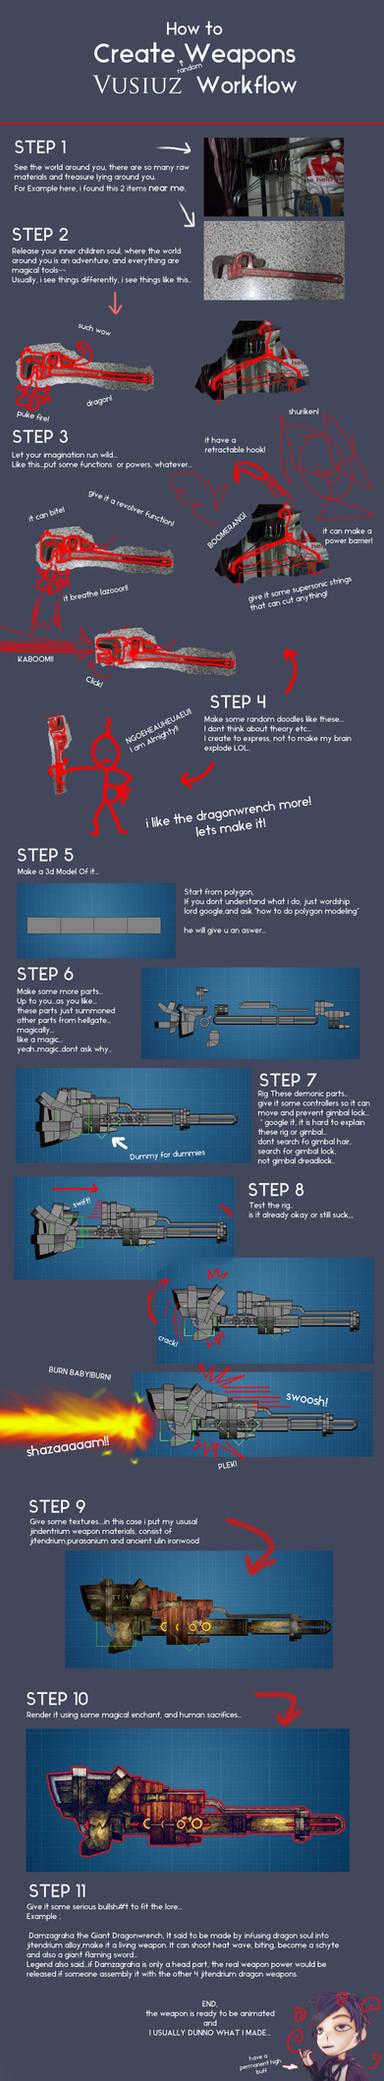 Vusiuz Workflow: How to Create Weapons!